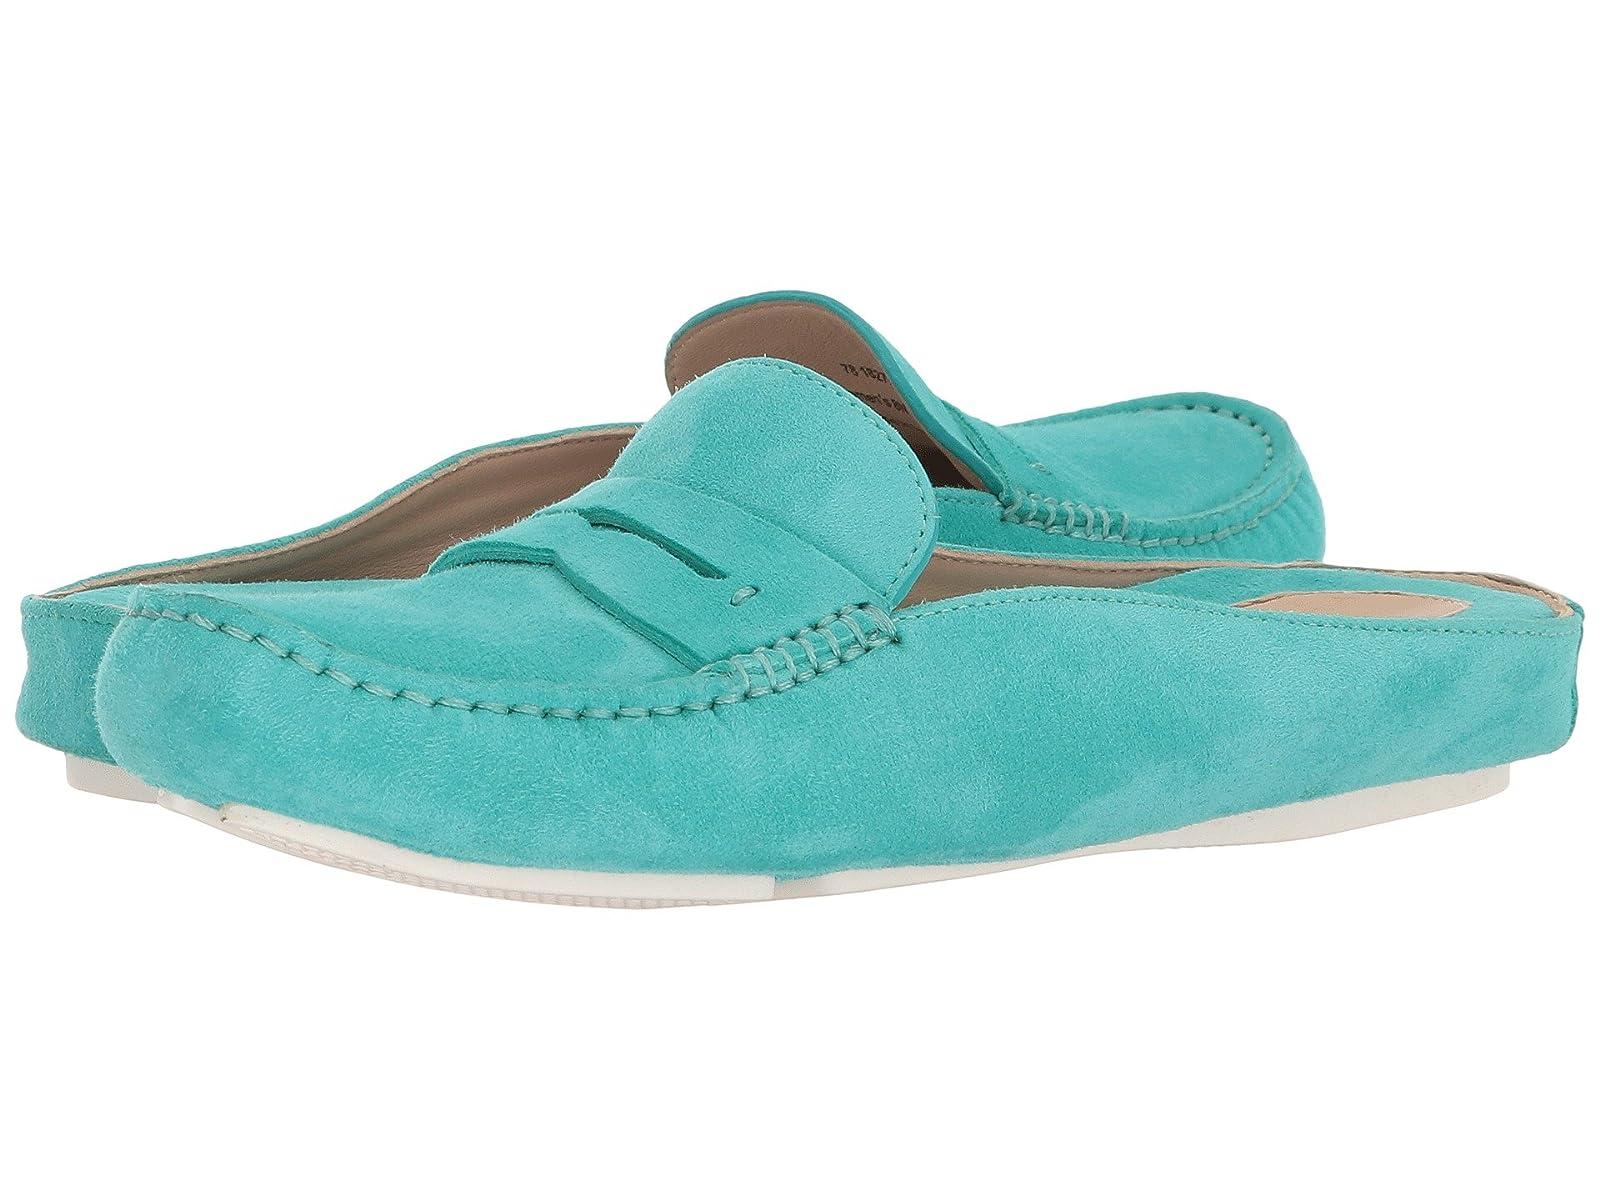 Johnston & Murphy MyahAtmospheric grades have affordable shoes